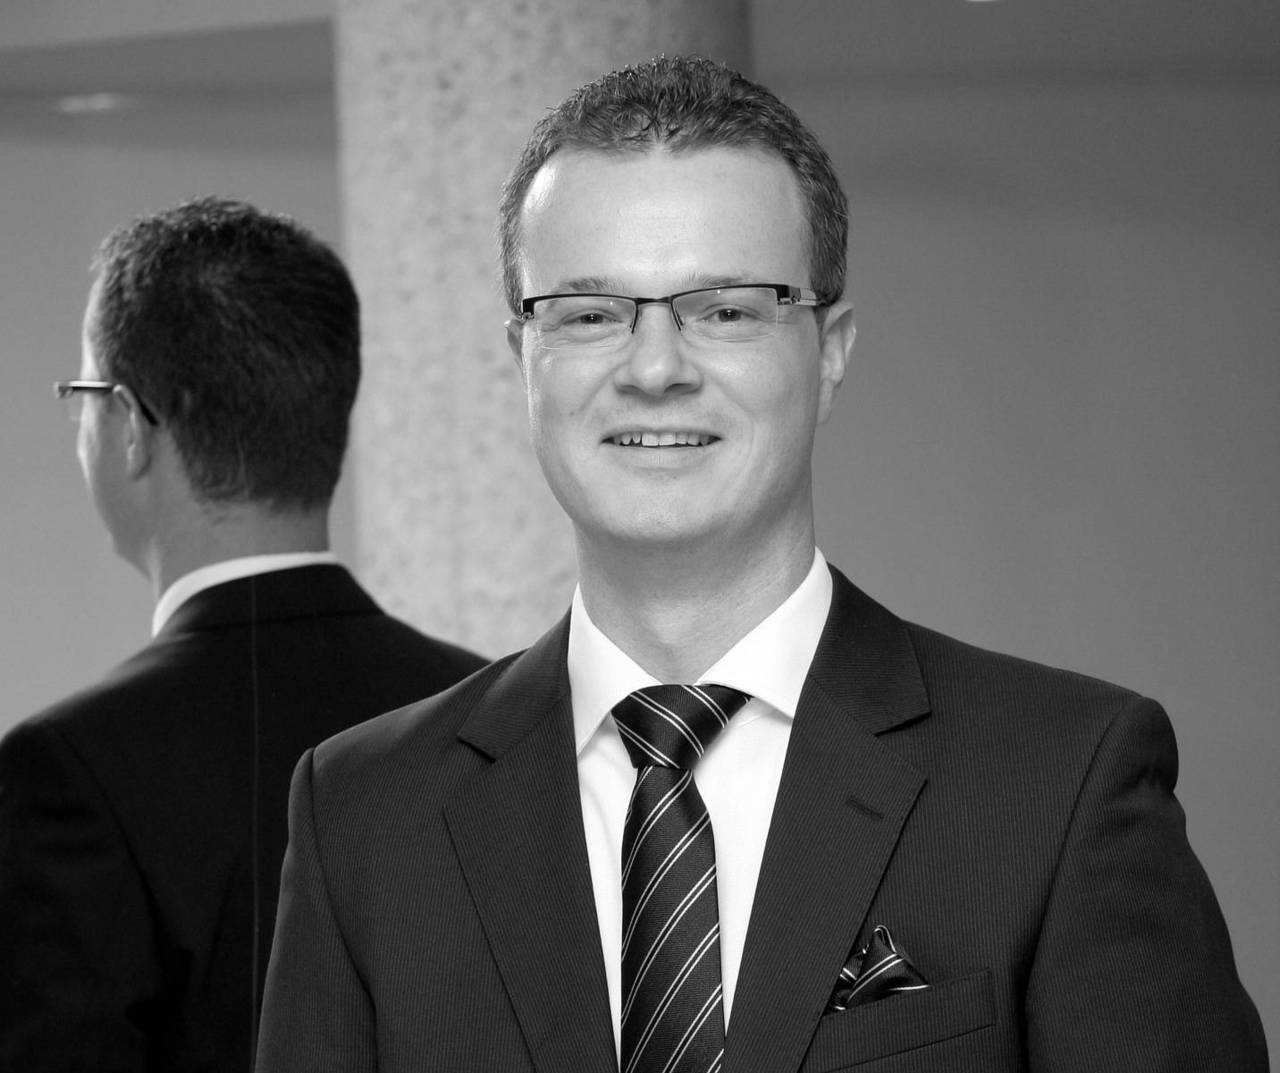 Claus M. Büttner